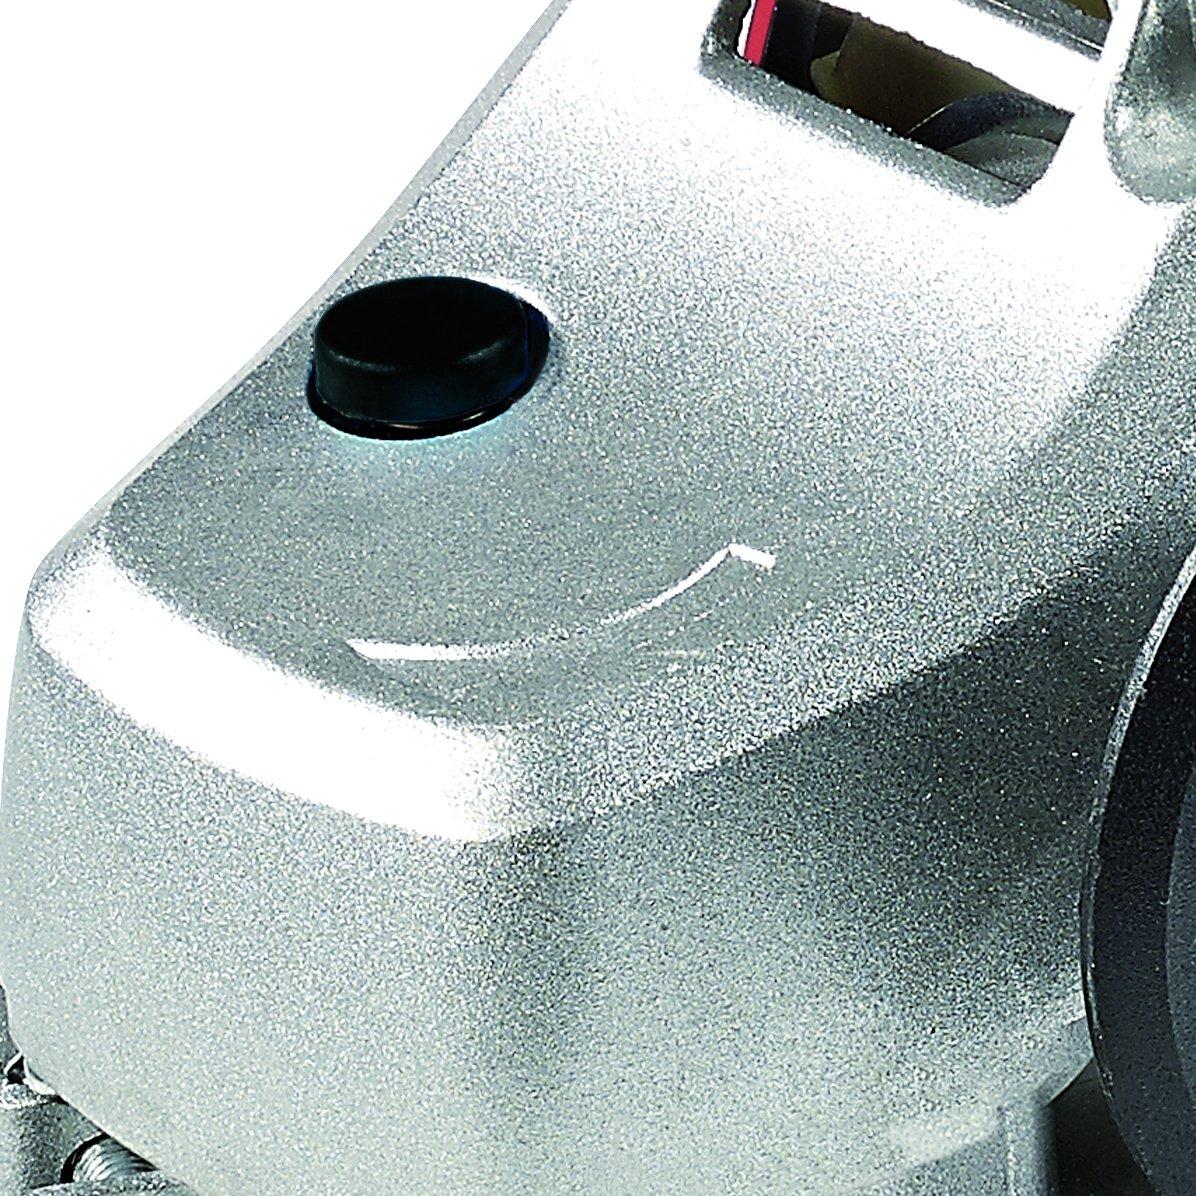 Amoladora Einhell TC-AG 125 por solo 30,78€